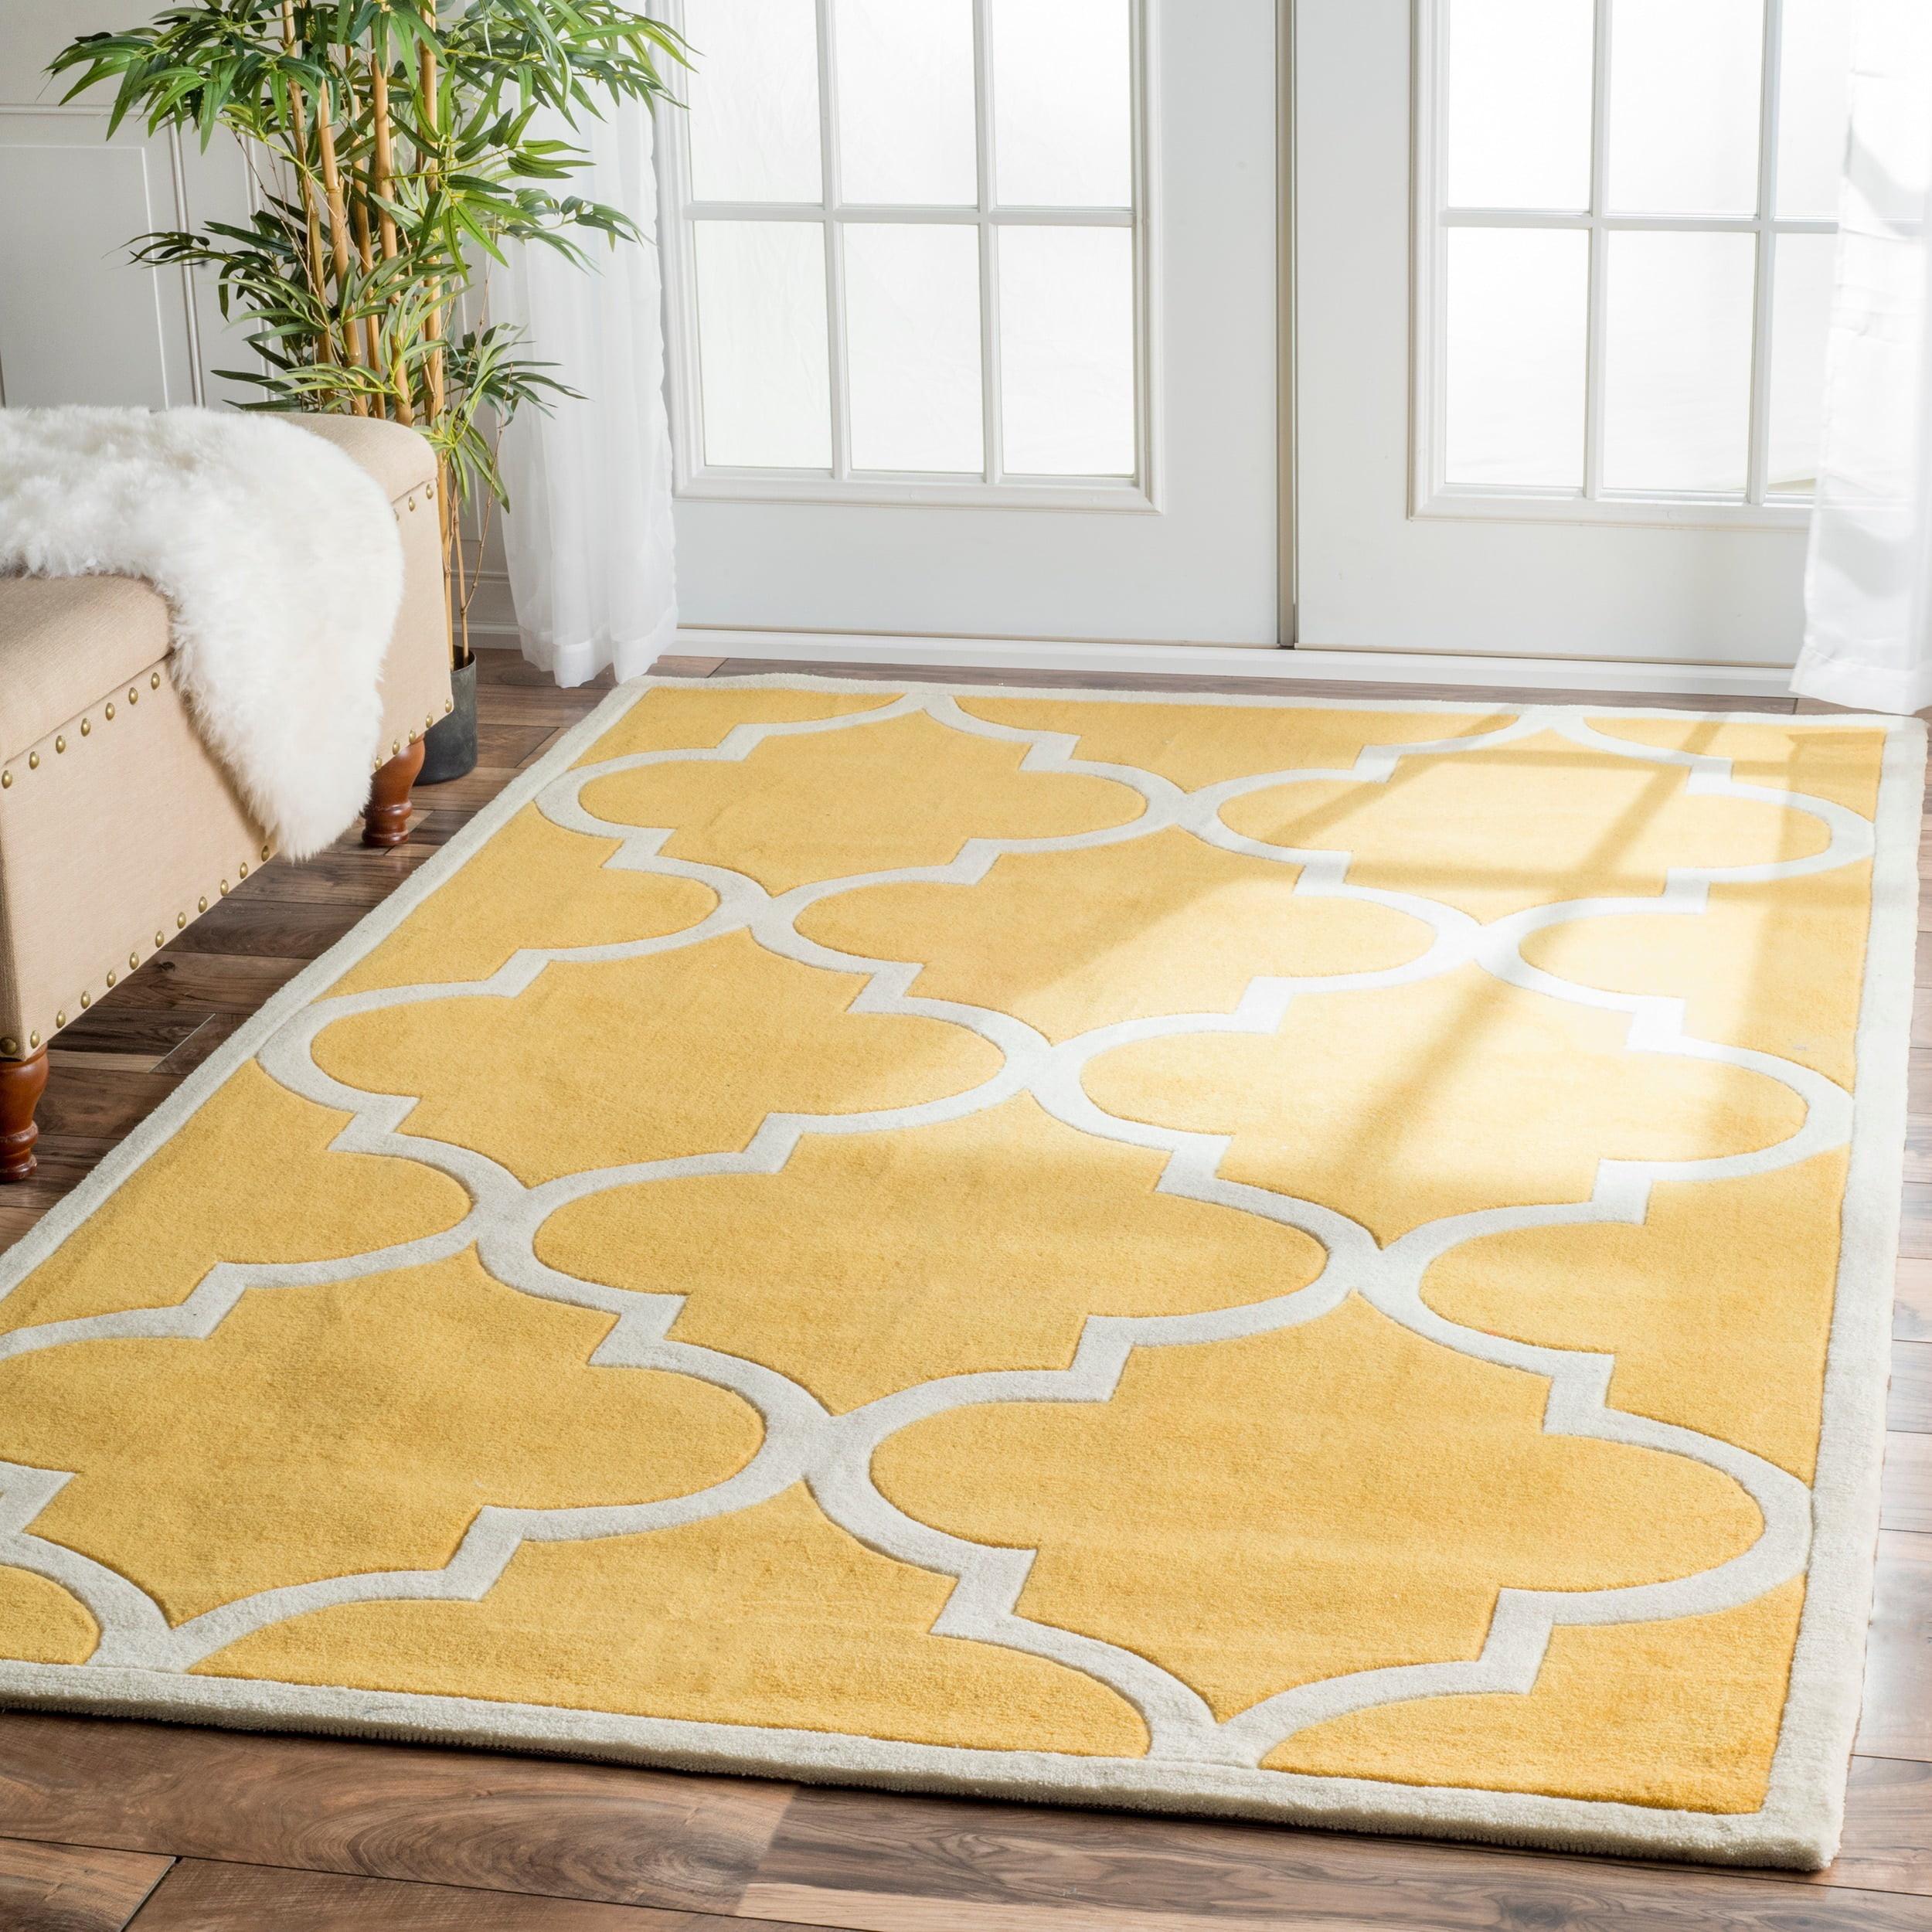 white eco rugs multi natural rug reversible antiquity handmade safavieh red wool beautiful fiber traditional alexa lovely border jute x of nuloom braided chair